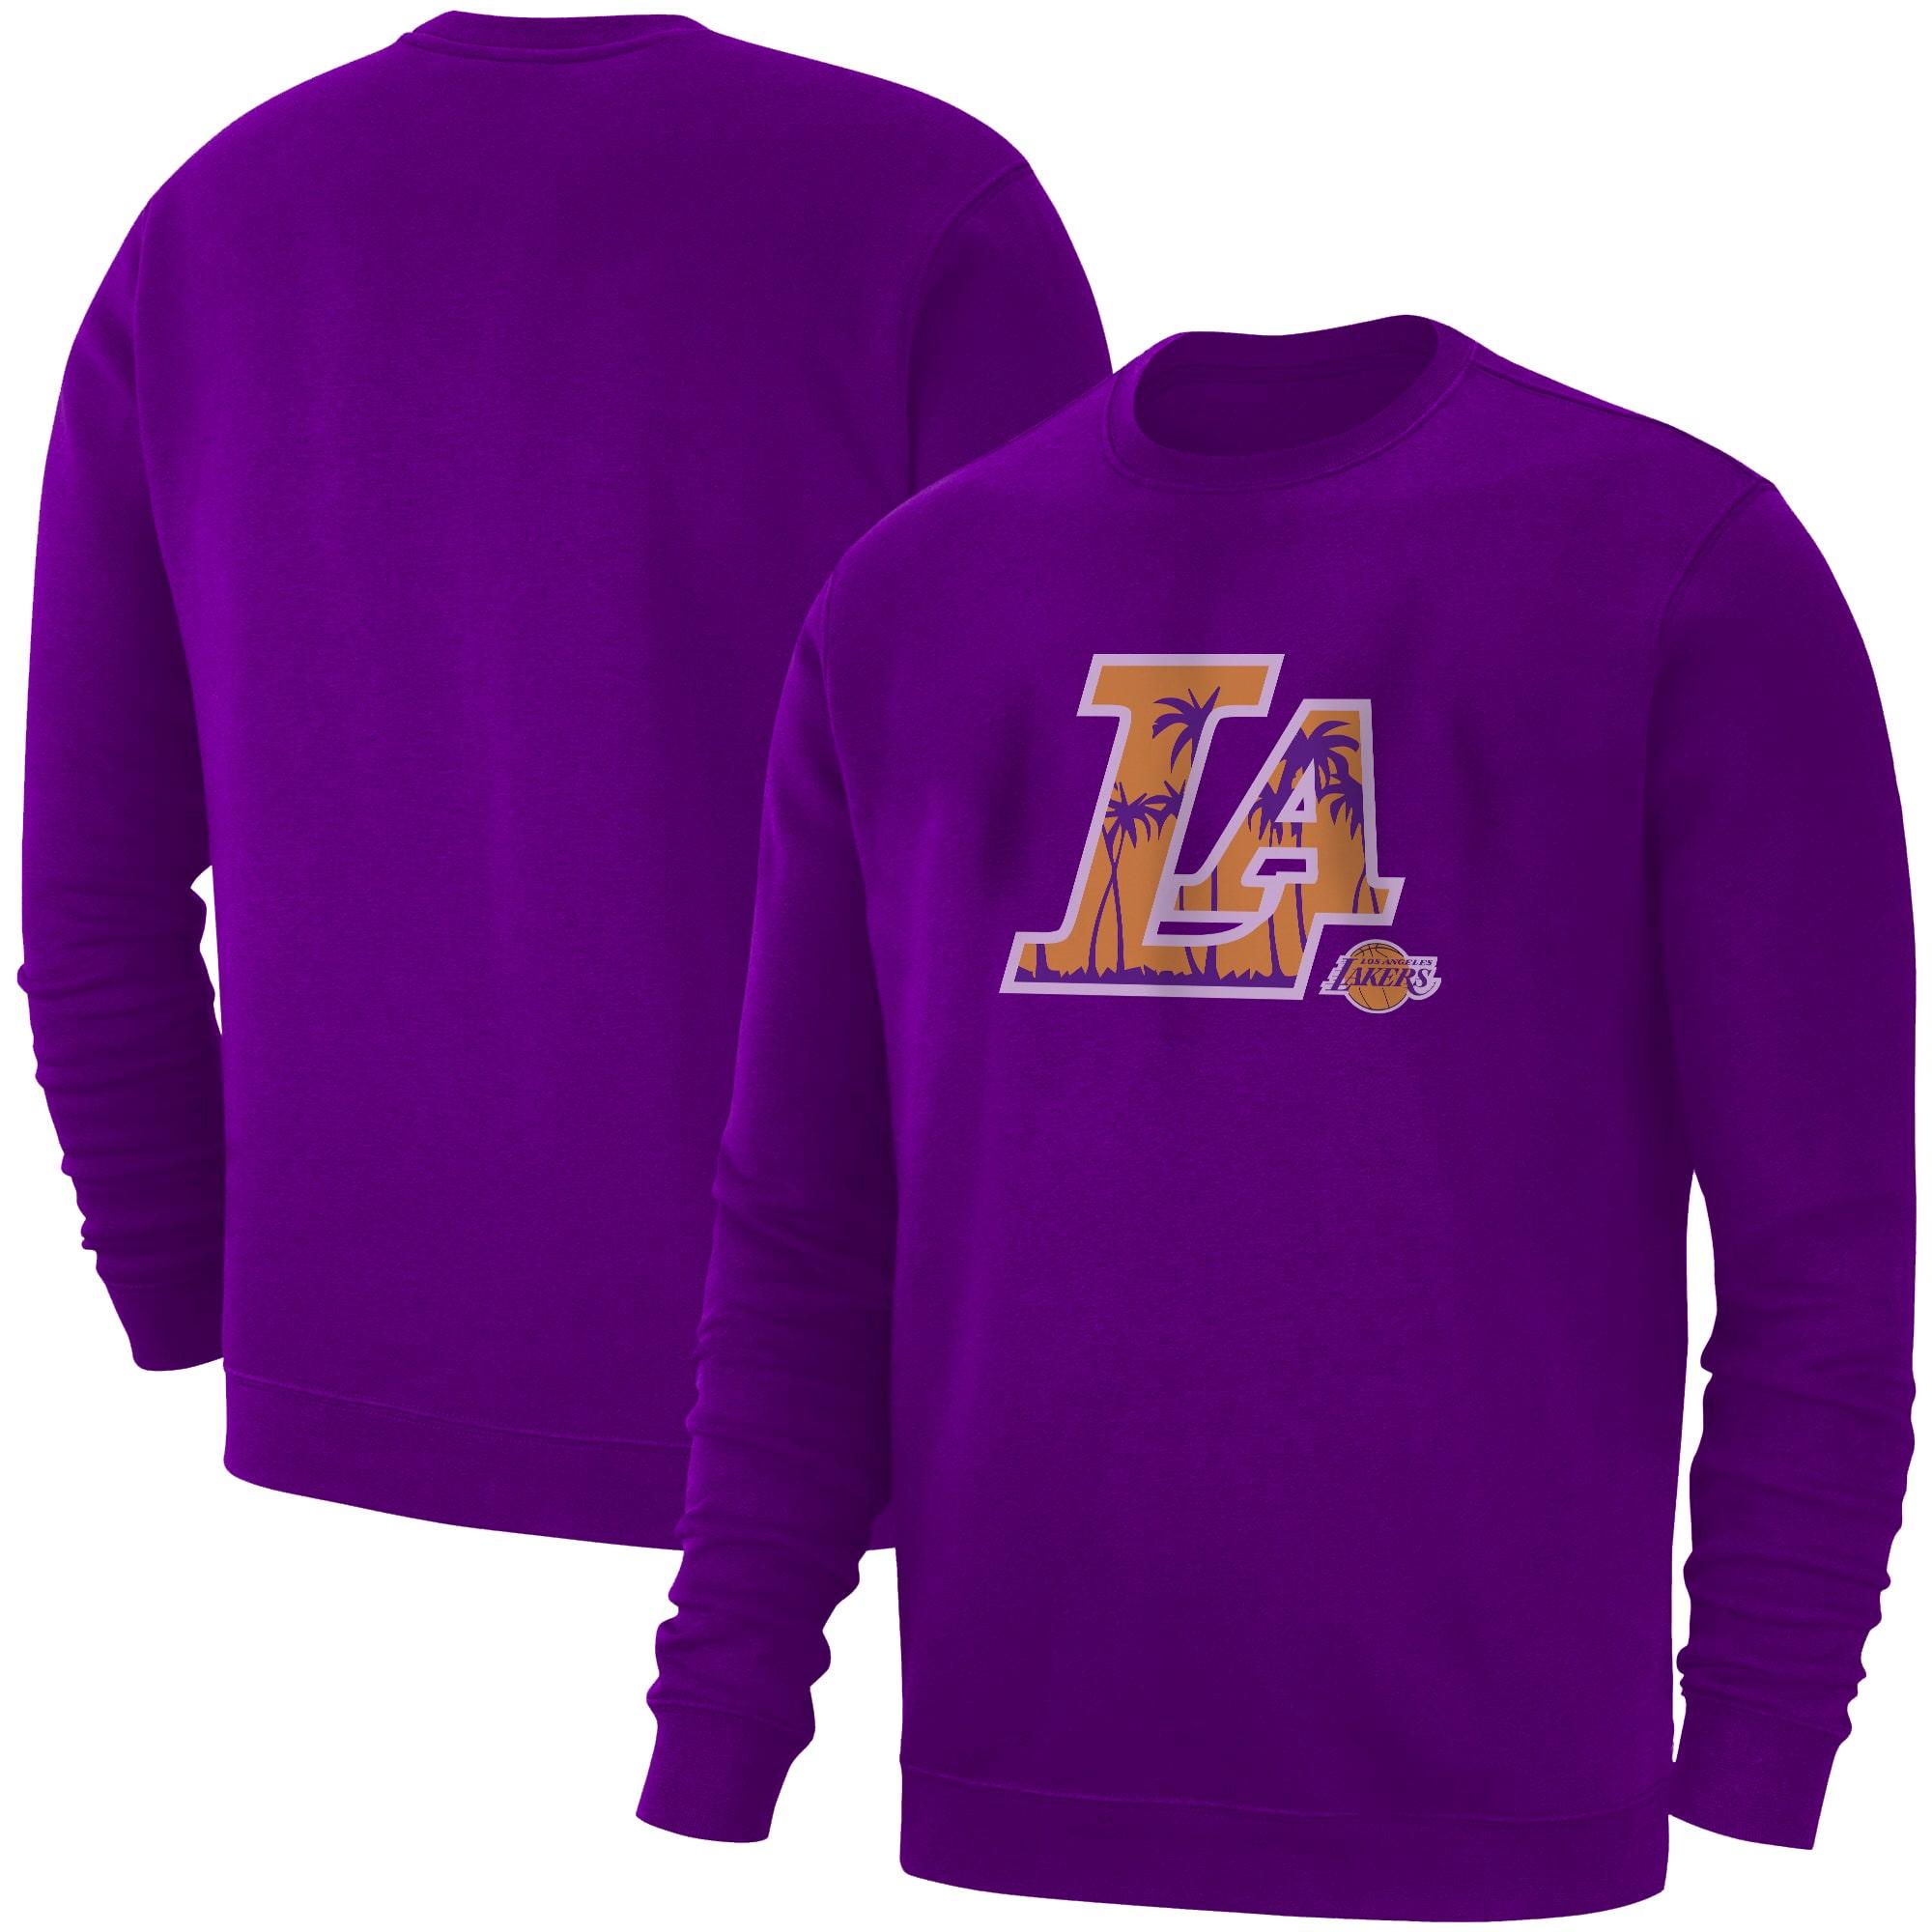 L.A. Lakers  Basic (BSC-PRP-NP-142-NBA-LAL-L.A.)